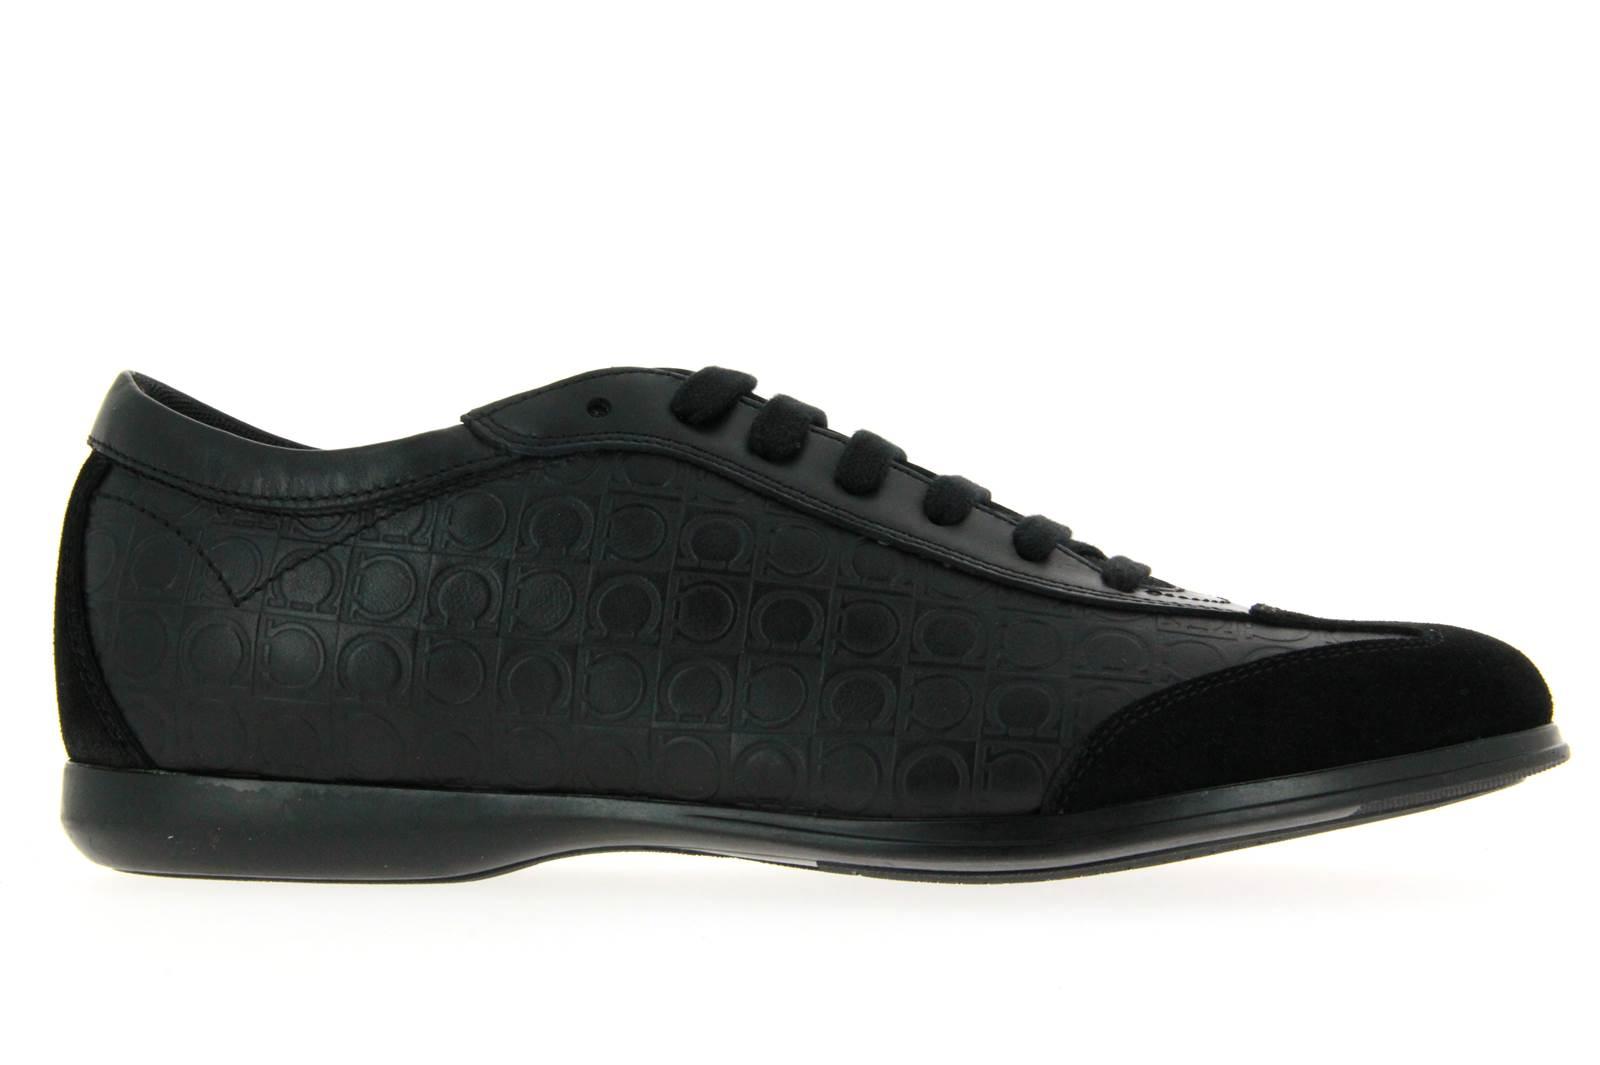 Salvatore Ferragamo Sneaker - FALKLAND NERO SUEDE CALF (39)